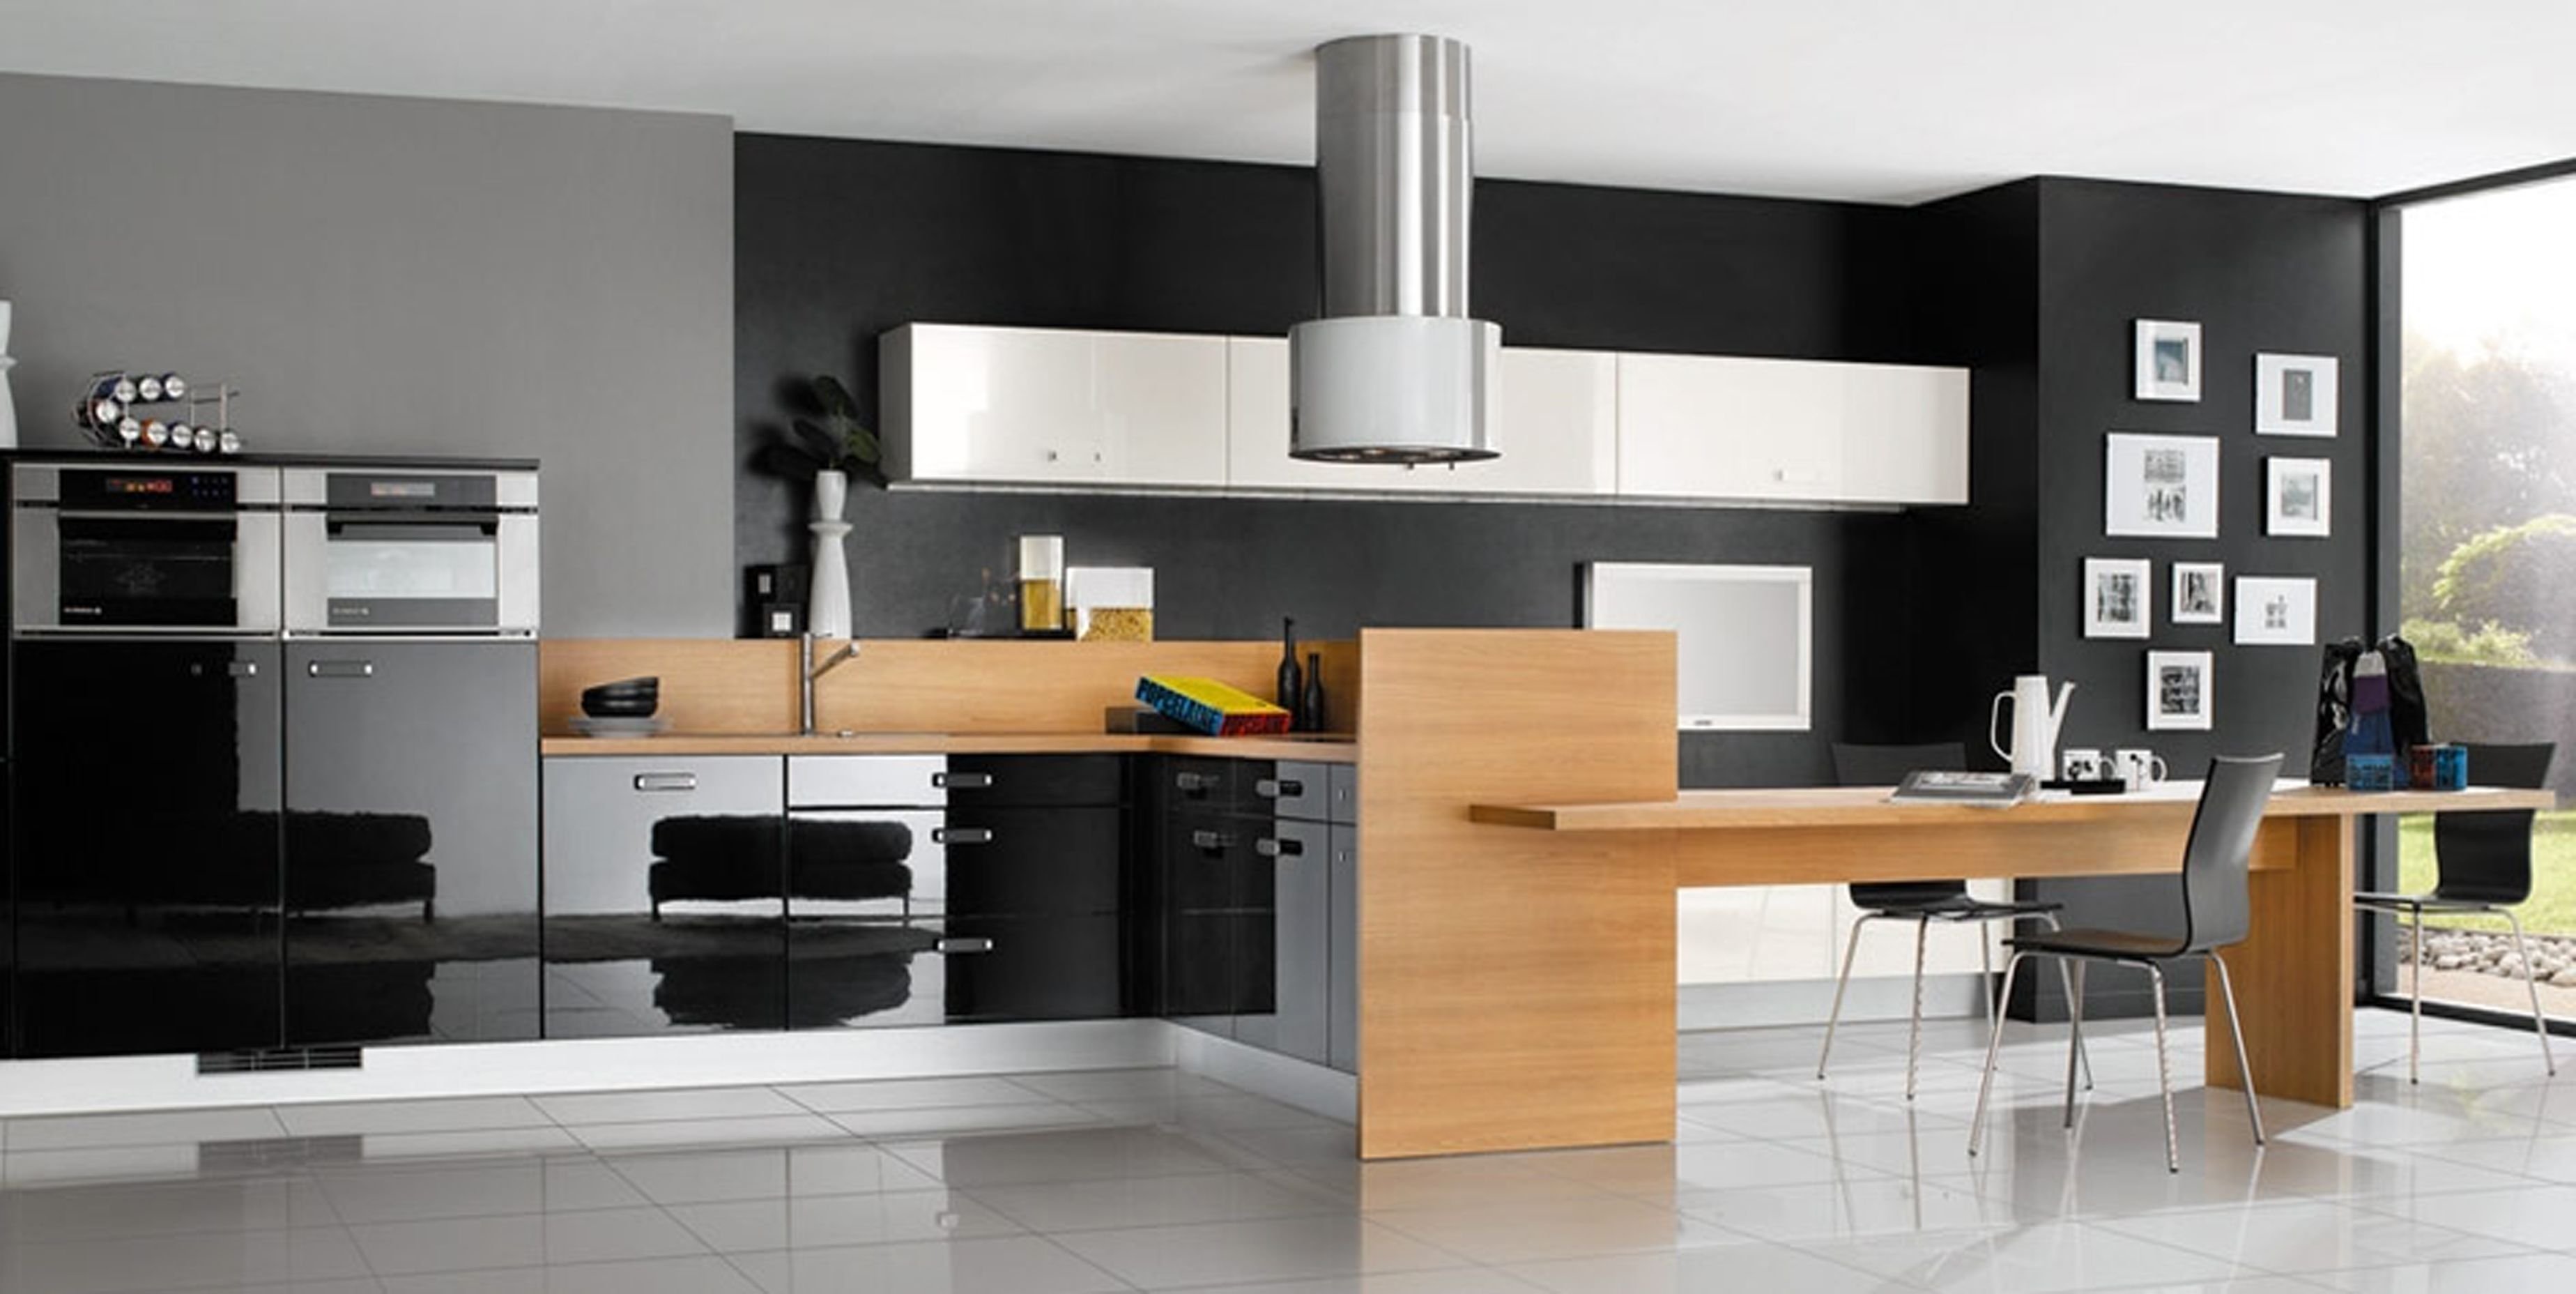 Kitchen Flooring Design Ideas Farmhouse Kitchen Design Ideas Kitchen Design  Ideas Small #Kitchen